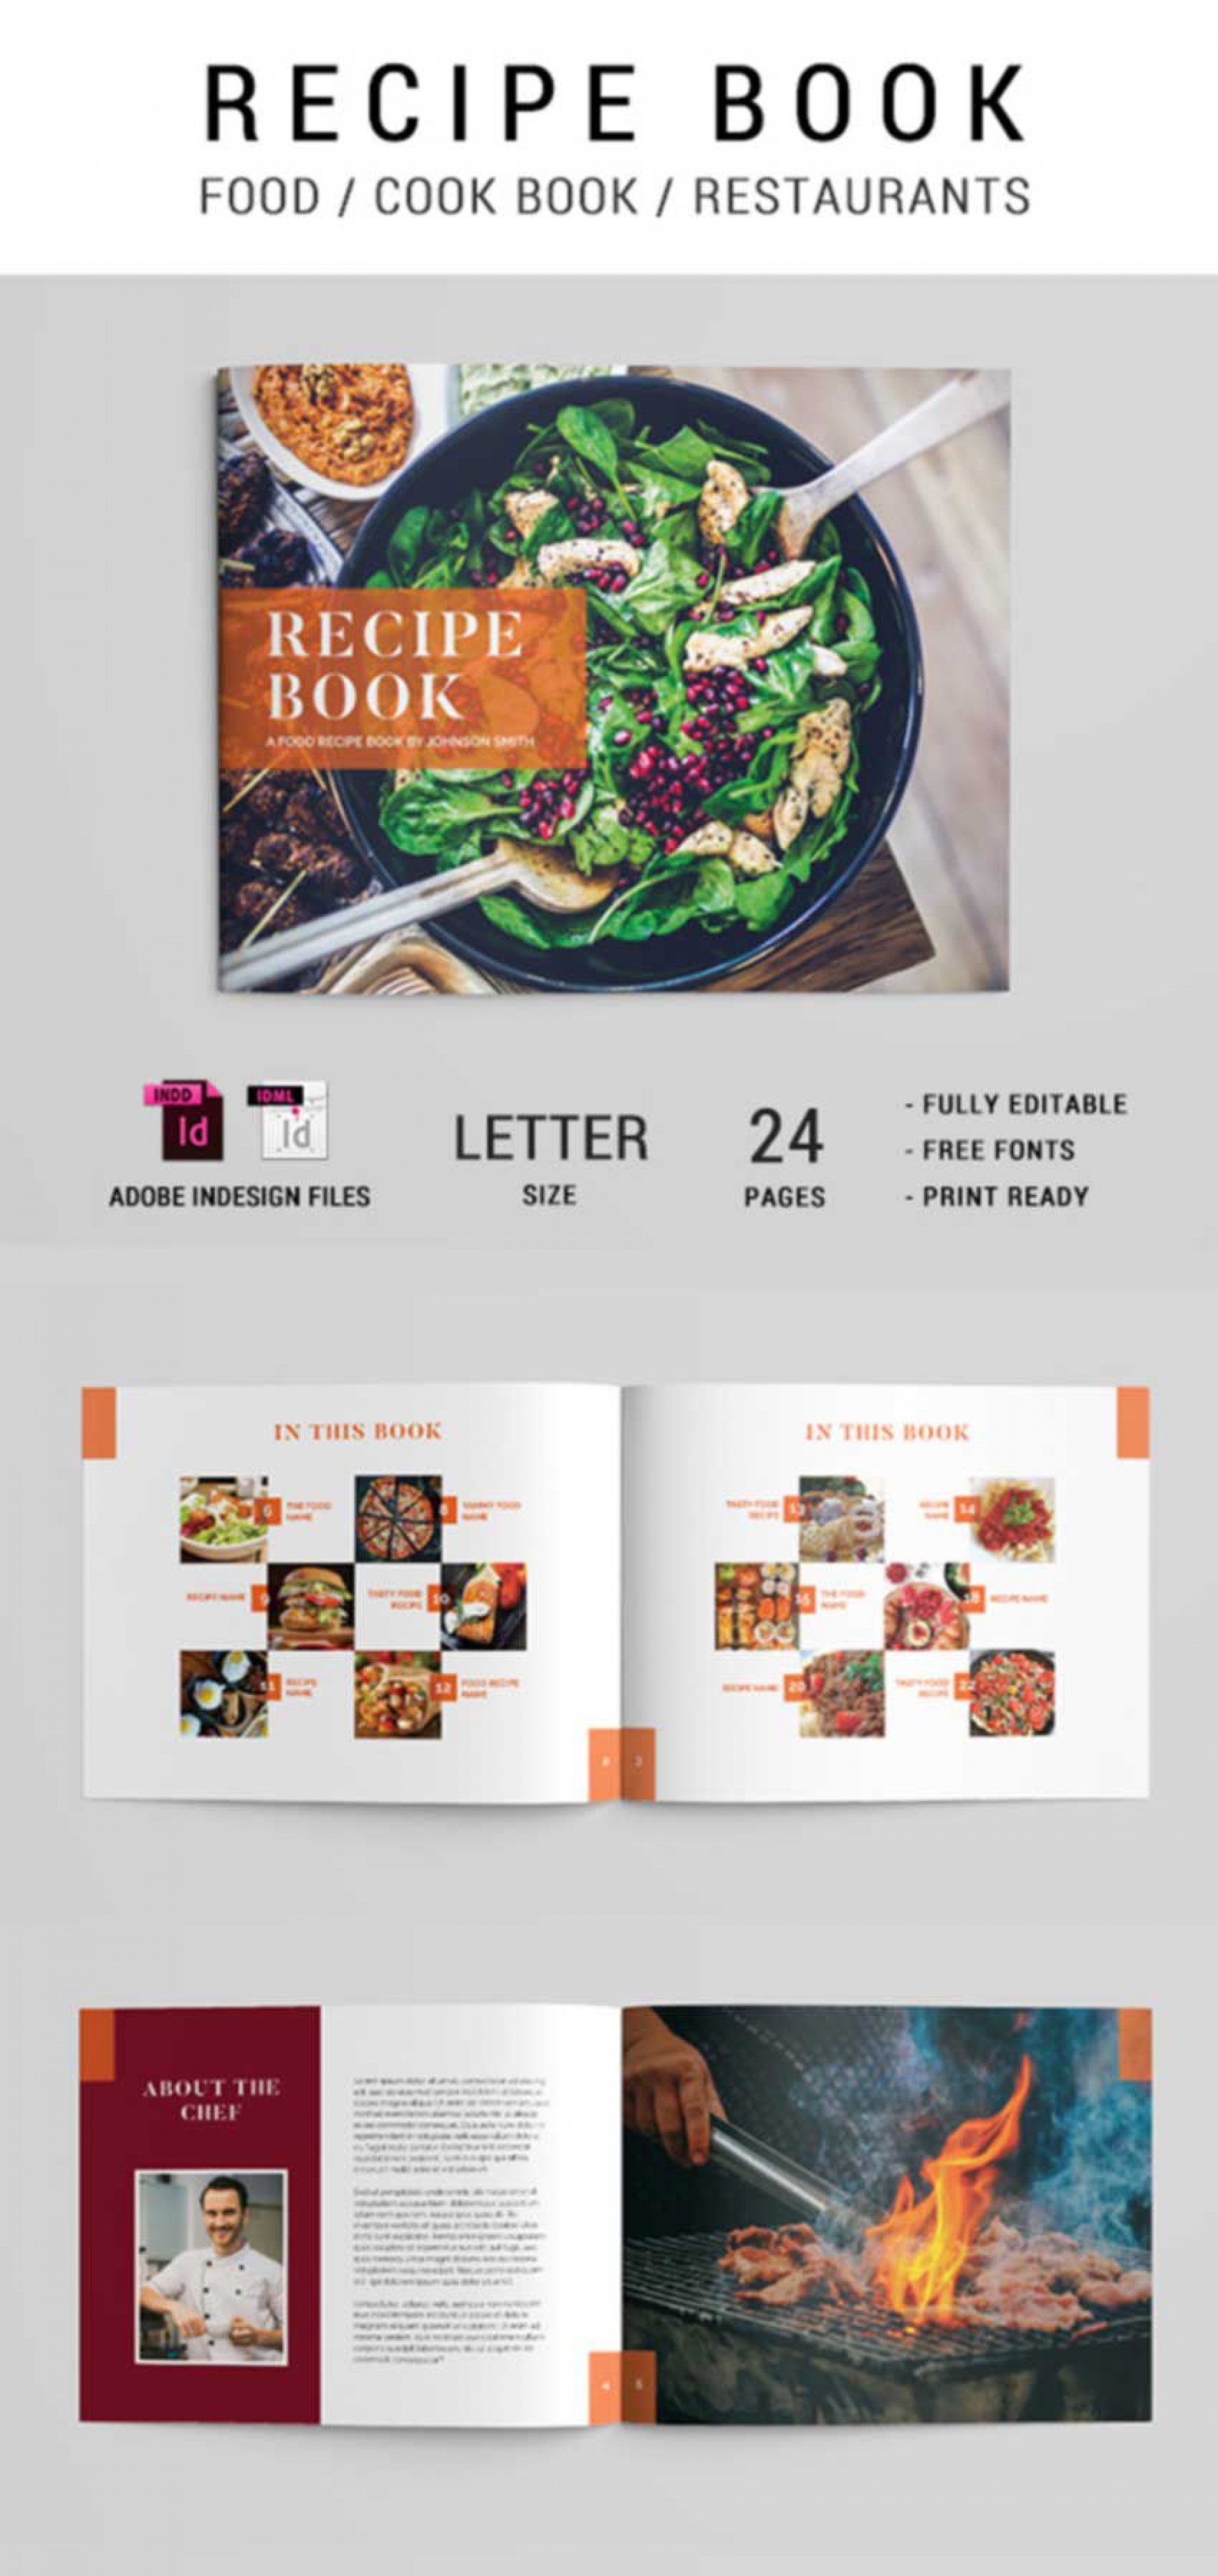 009 Breathtaking Make Your Own Cookbook Template Idea  Create Free1920